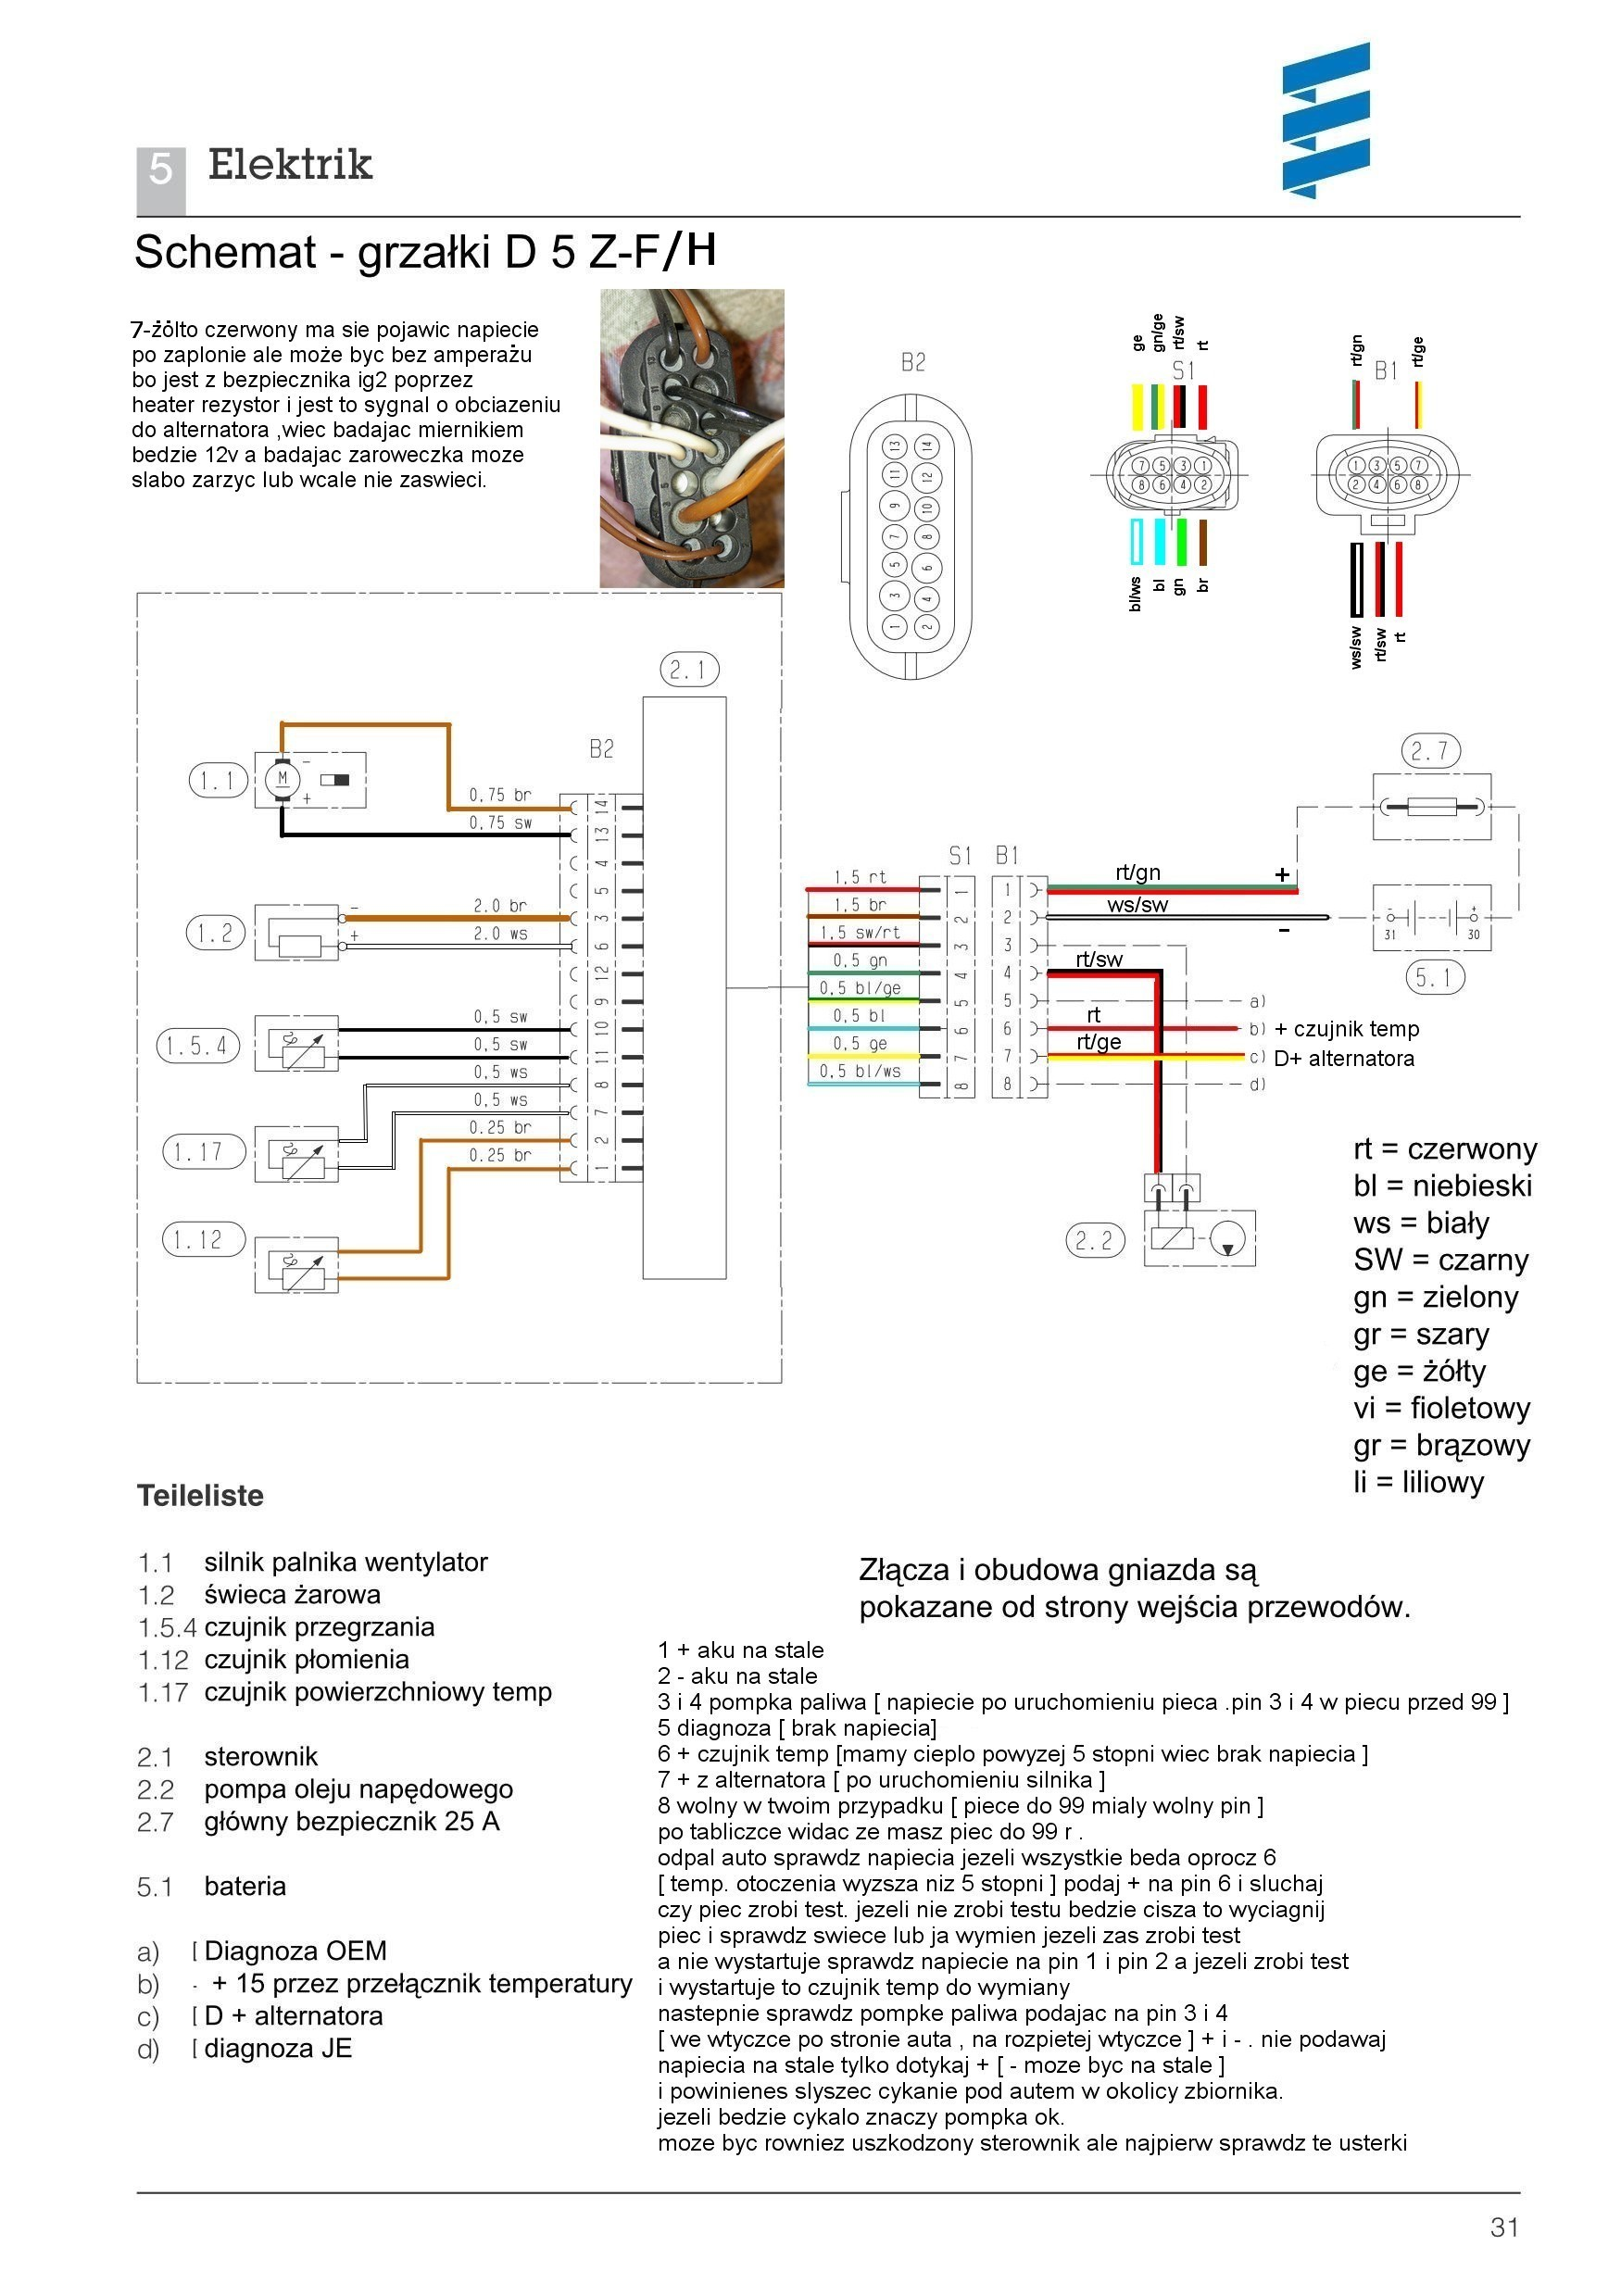 Toyota Corolla D5Z-H - Szukam schematu do Eberspacher HYDRONIC D5Z-H  (webasto ;)